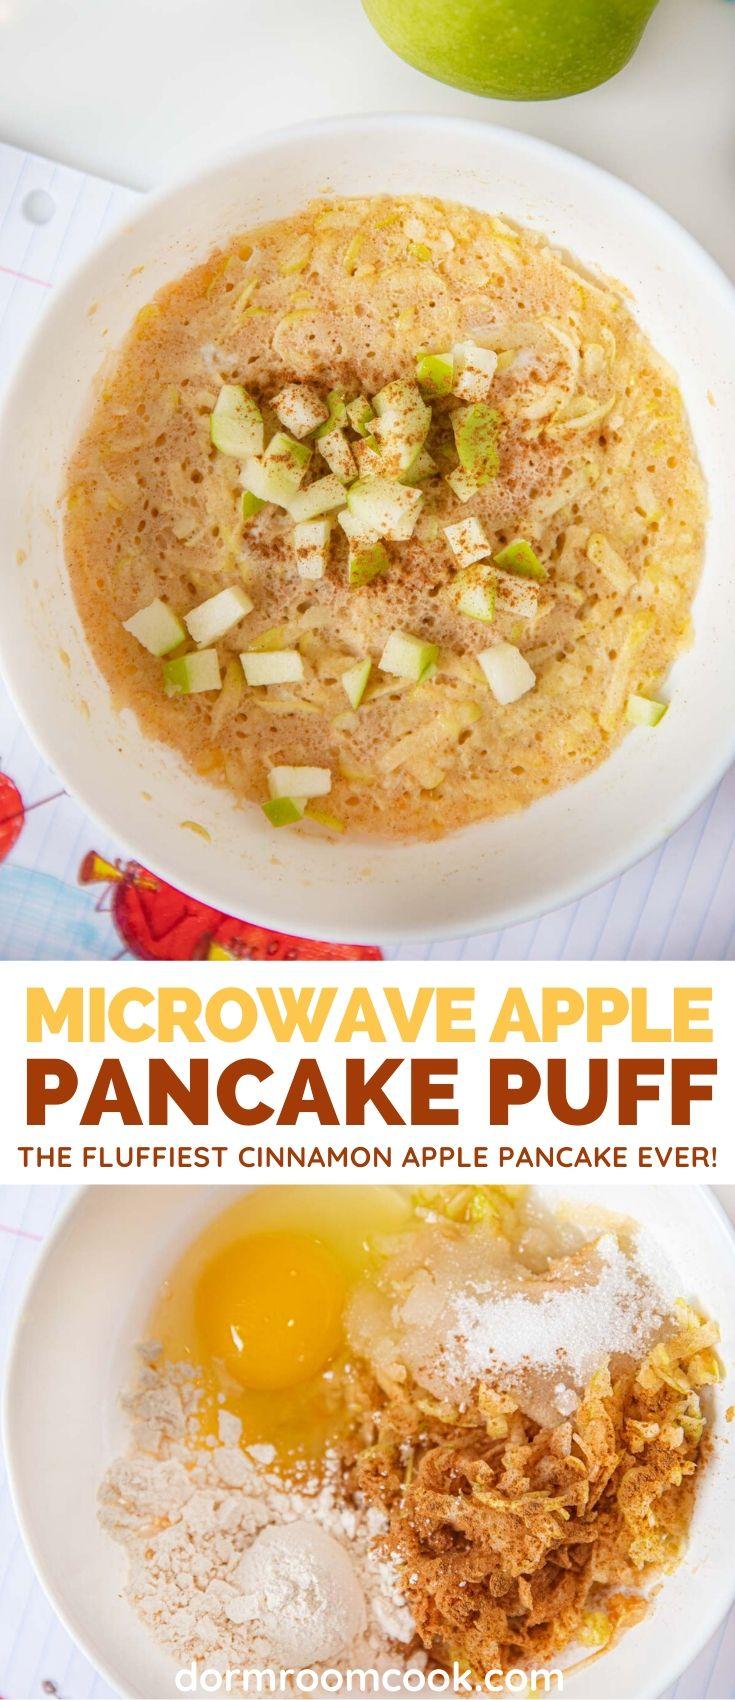 Easy fluffy Apple Pancake Puff